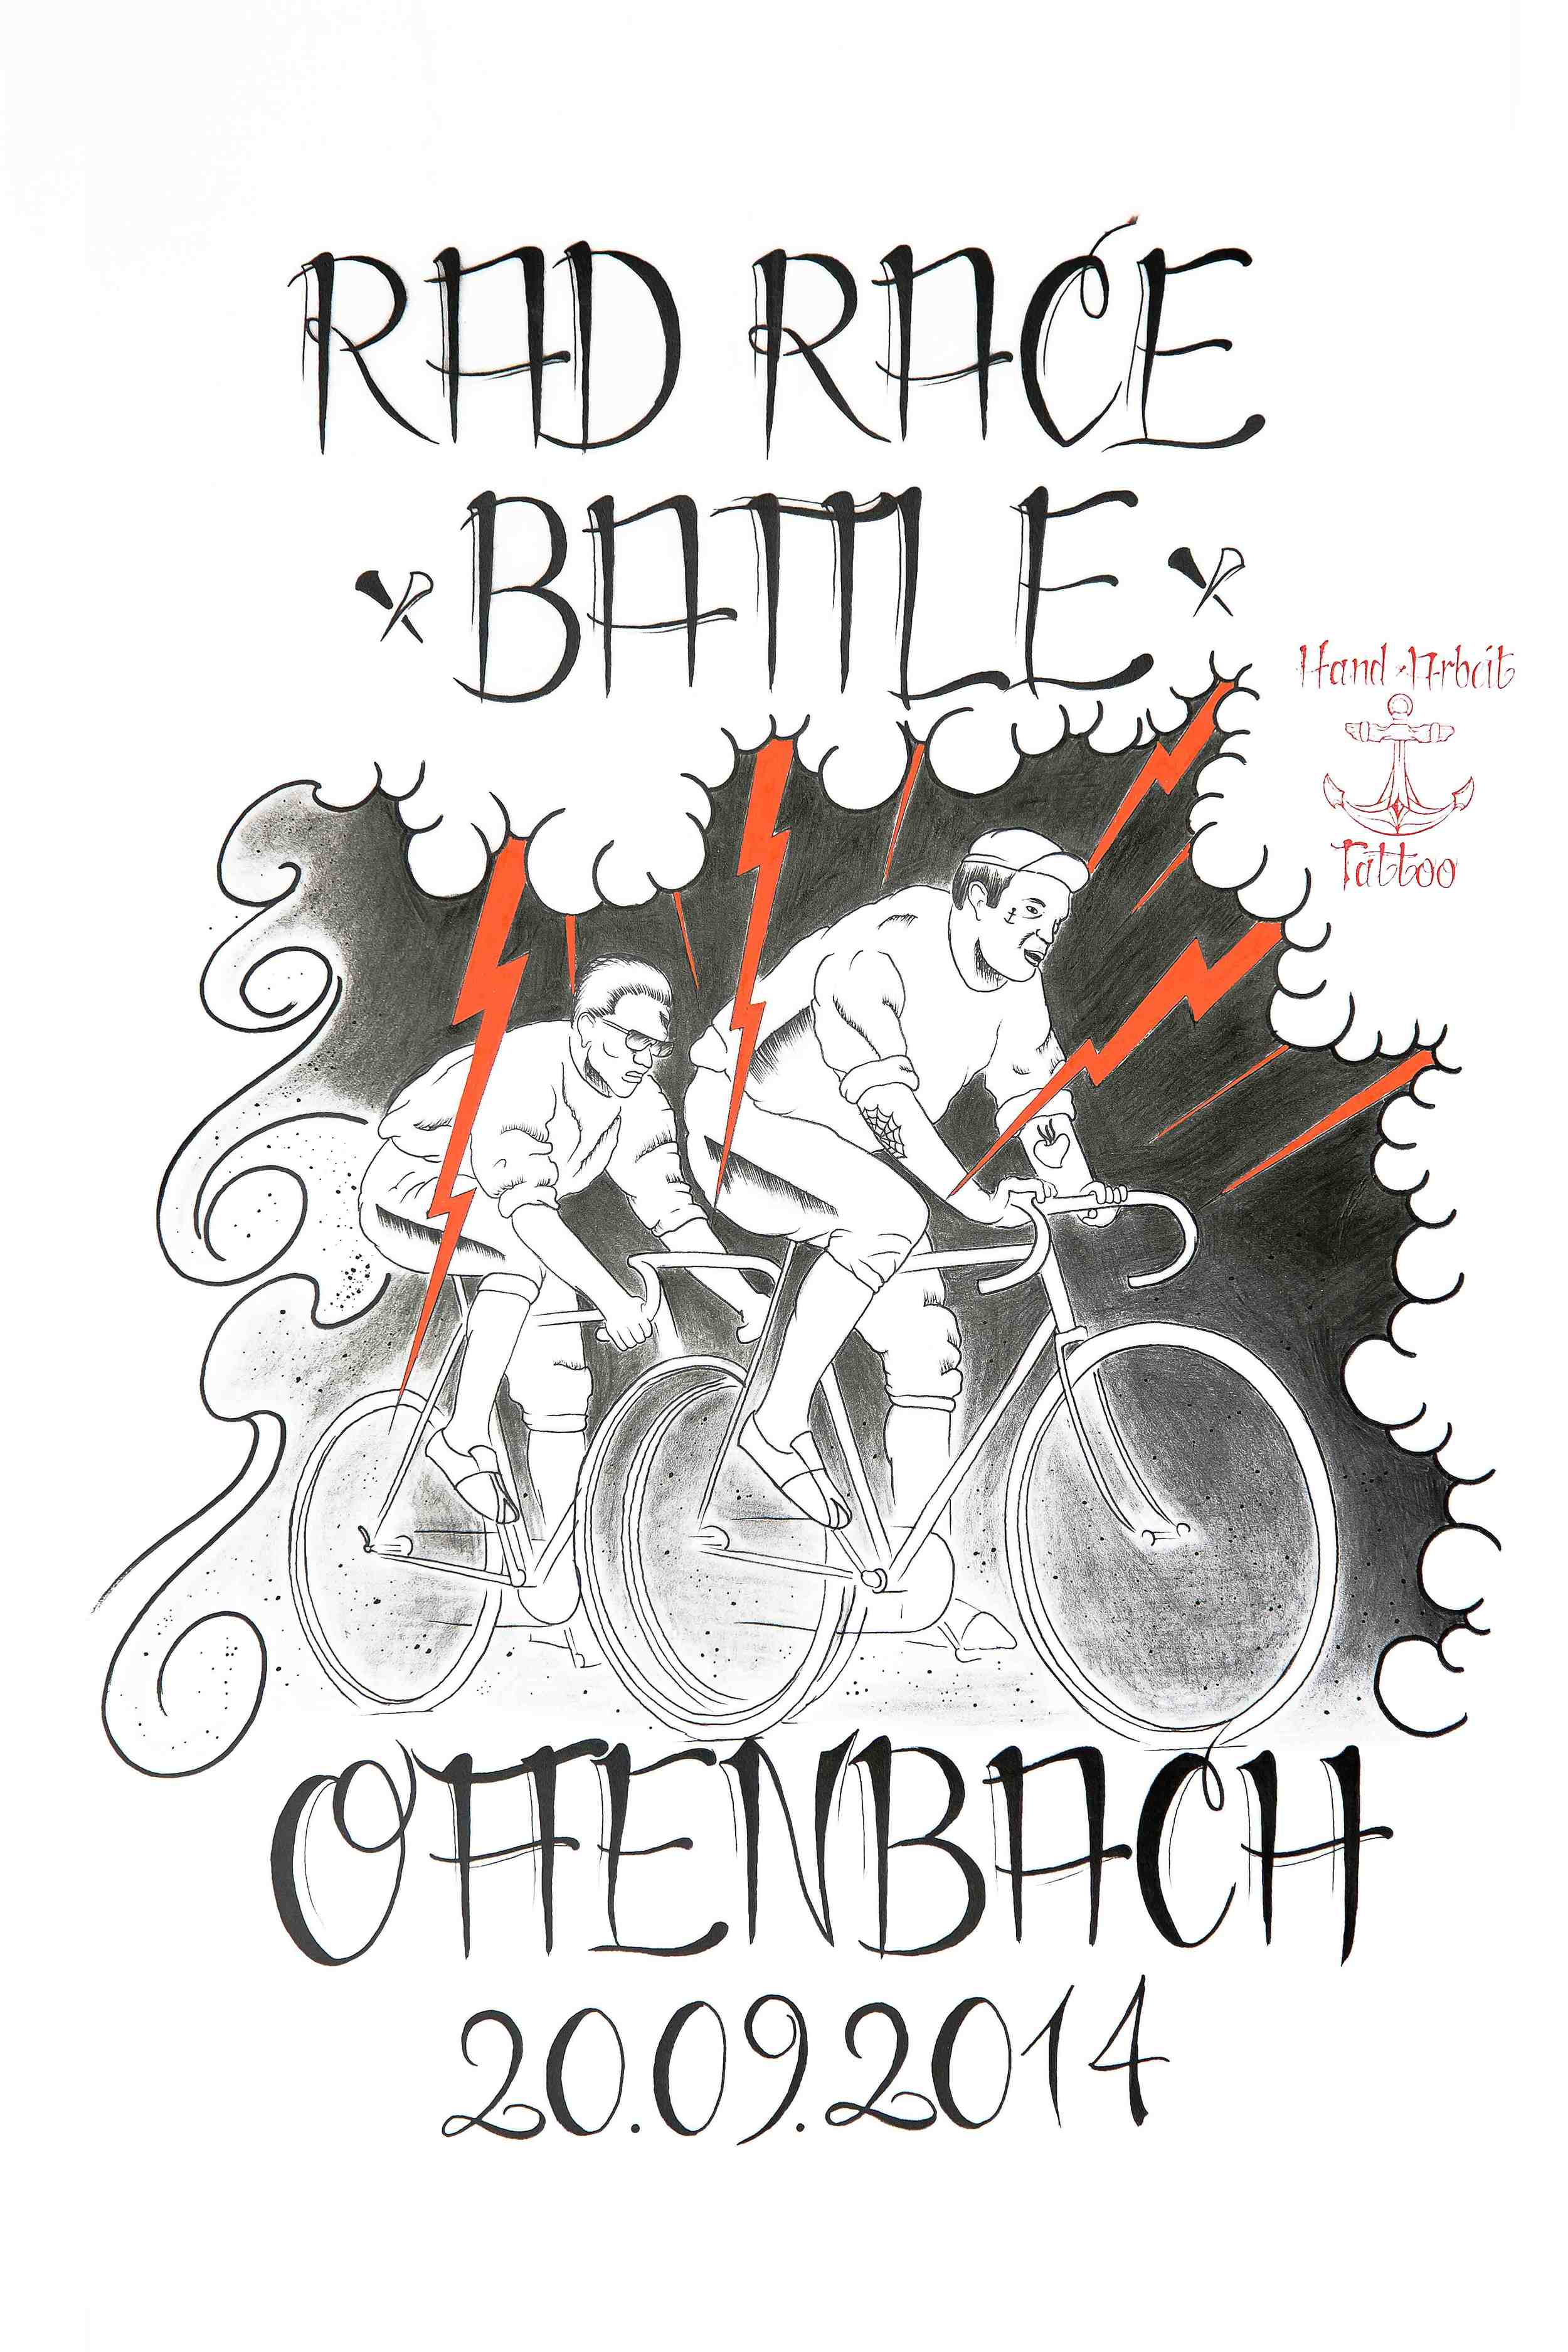 Das offizielle Poster zum ersten RAD RACE Battle mit bestem Dank an  Hand Arbeit Tattoo !